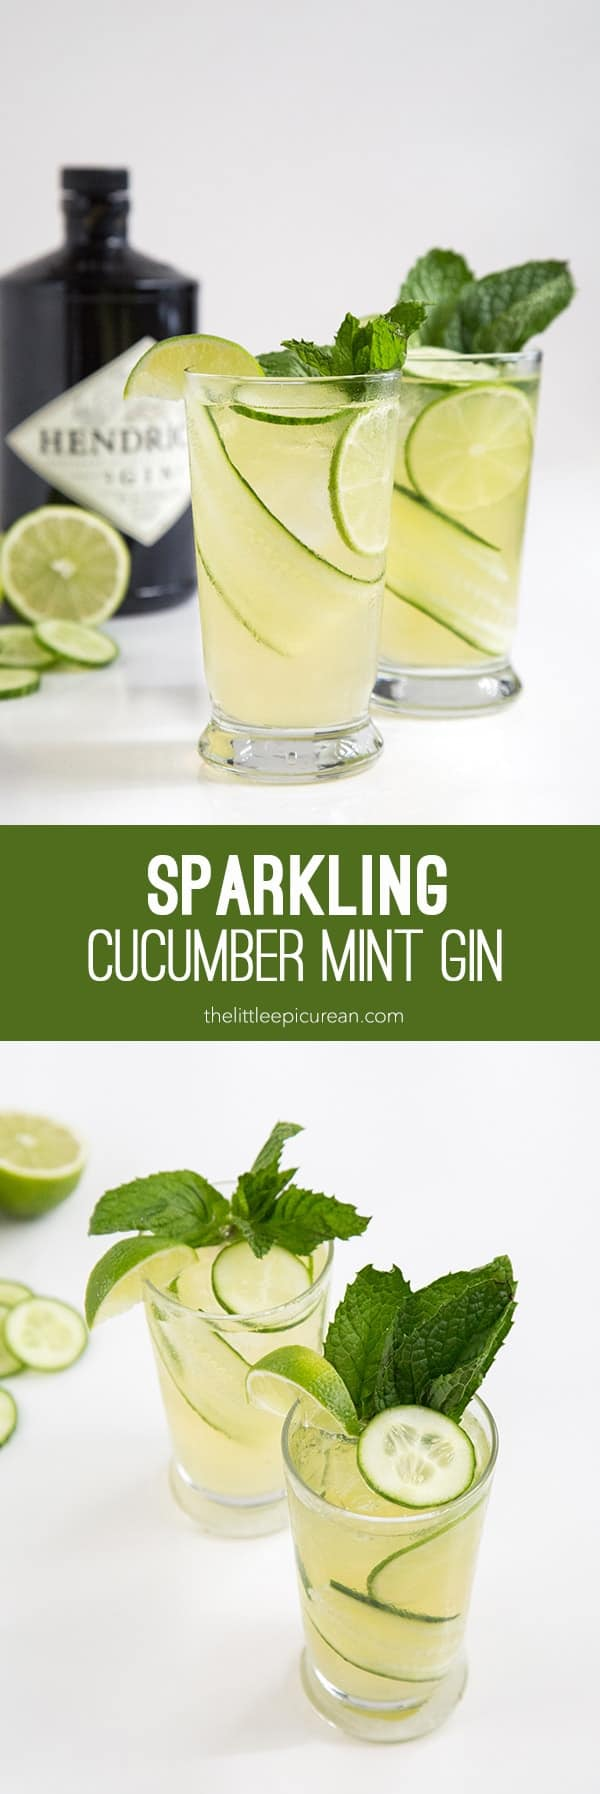 Sparkling Cucumber Mint Gin